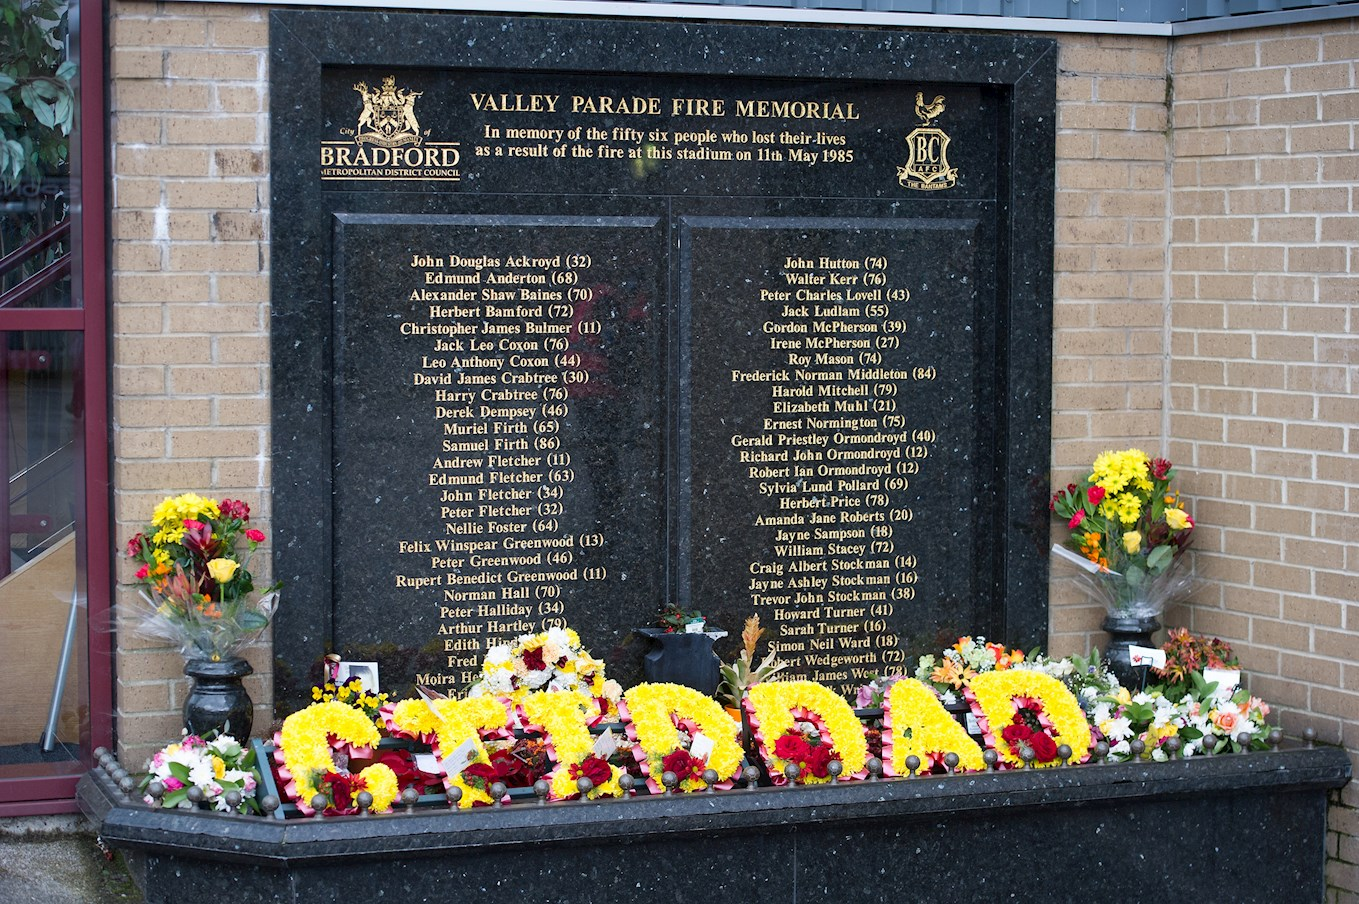 Valley Parade Memorial Arrangements - News - AFC Wimbledon